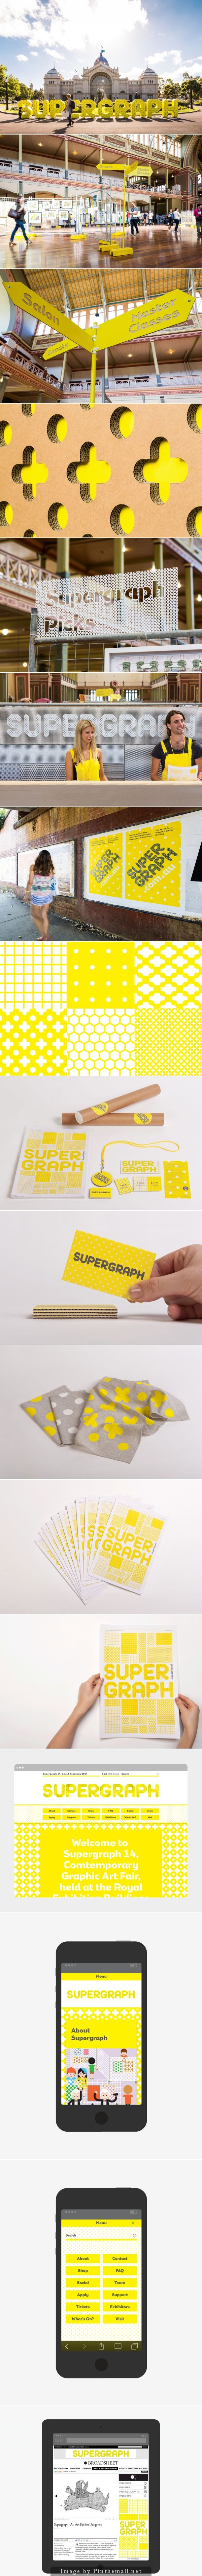 Supergraph identity design, environmental graphics, super graphics, signage